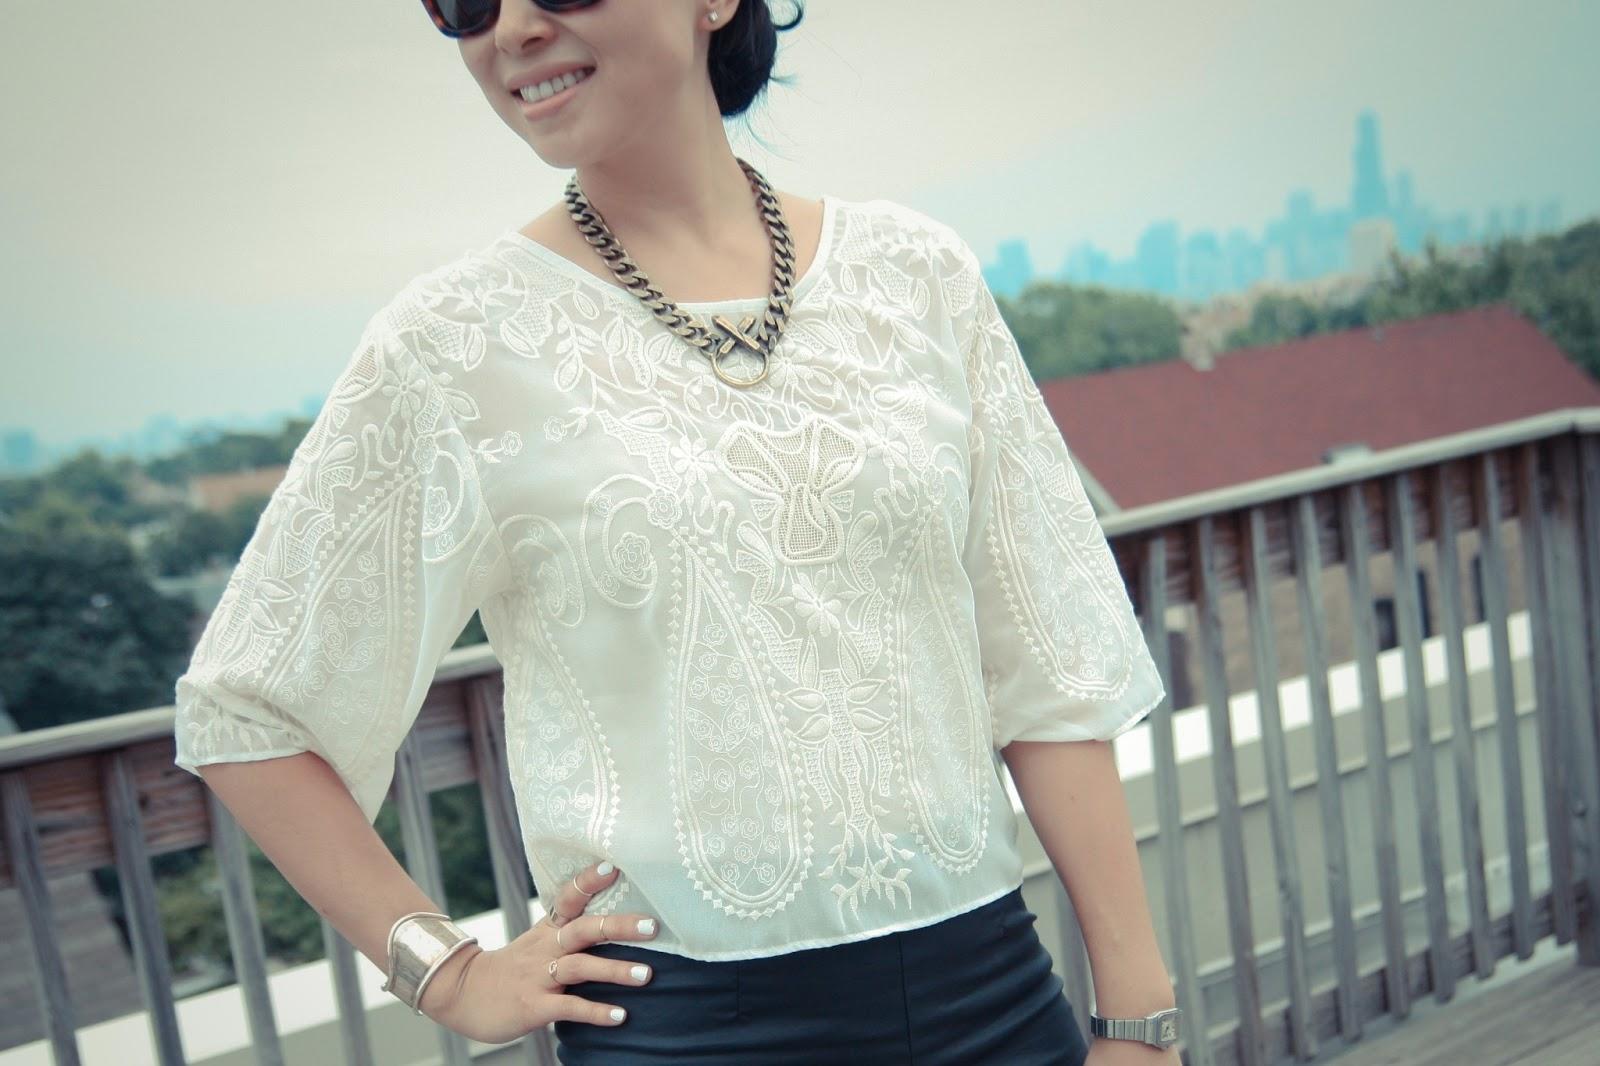 dress up files - a chicago fashion blog: Barong Tagalog Inspired